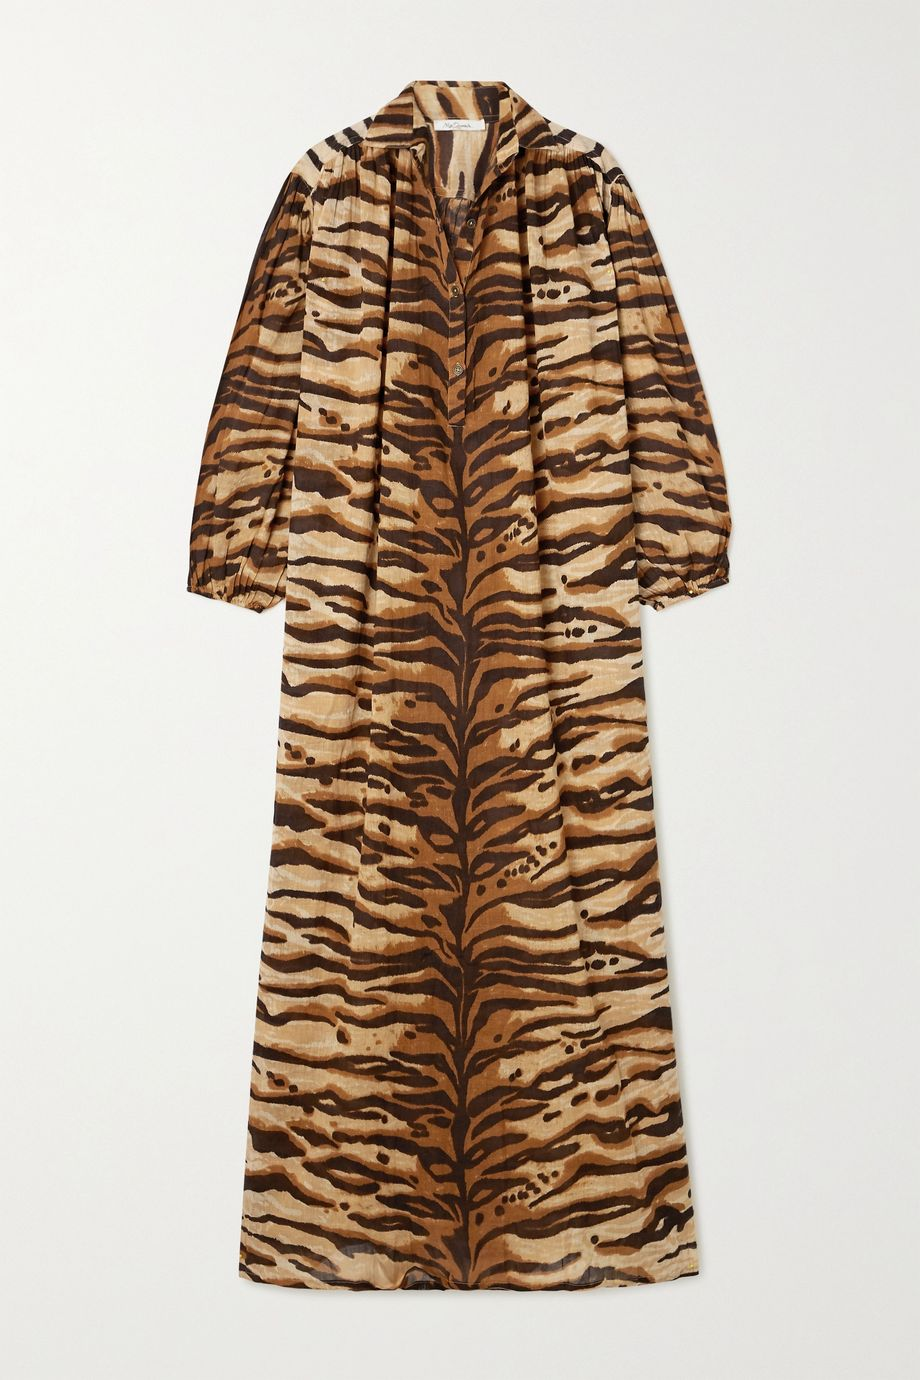 Mes Demoiselles Bangla tiger-print cotton-voile kaftan